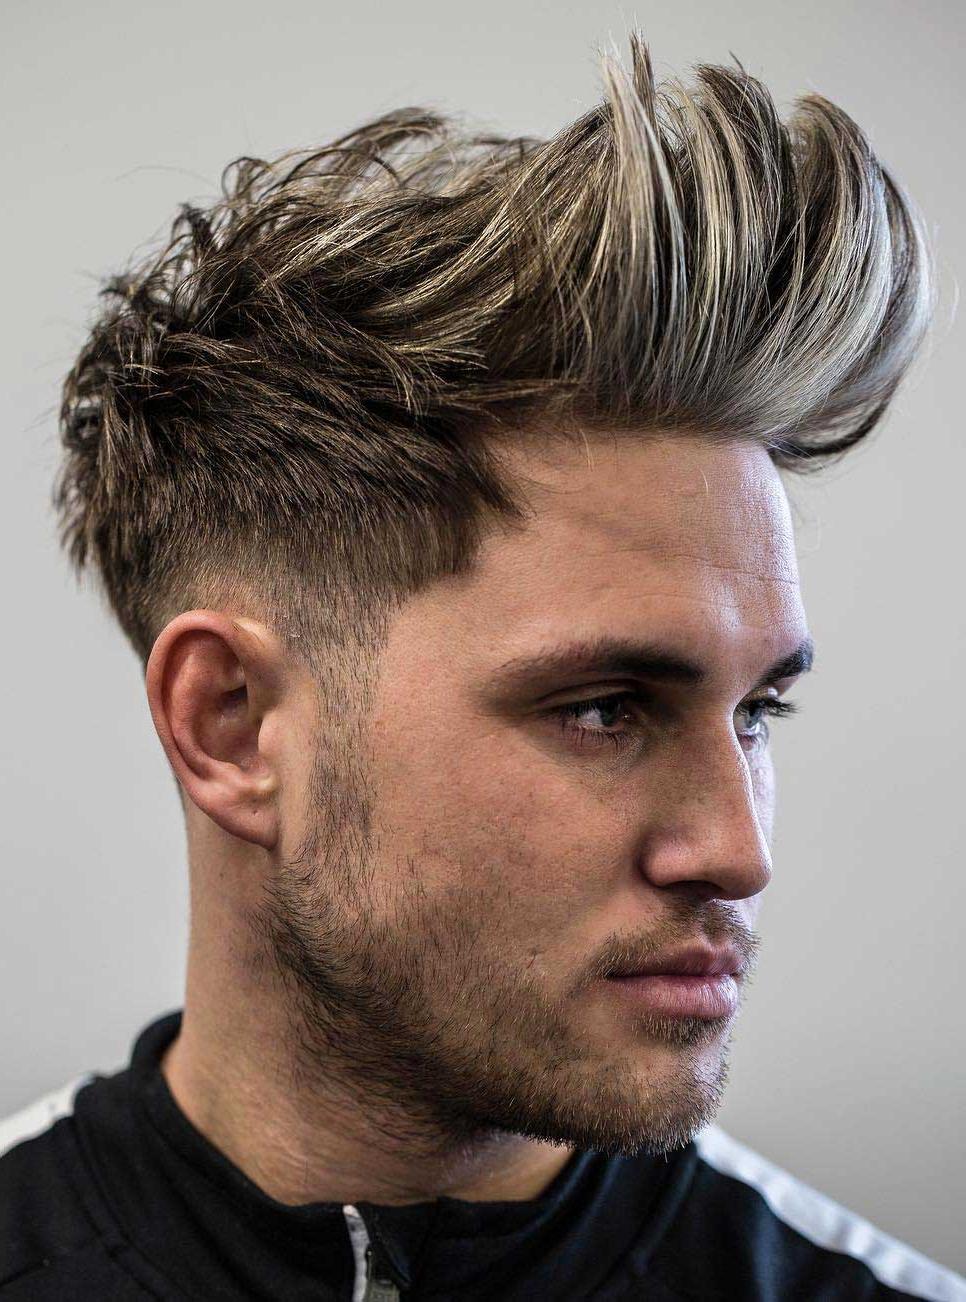 Famous Fauxhawk Haircuts In 20 Modern Faux Hawk (Aka. Fohawk) Hairstyles – Keep It Even (Gallery 3 of 20)